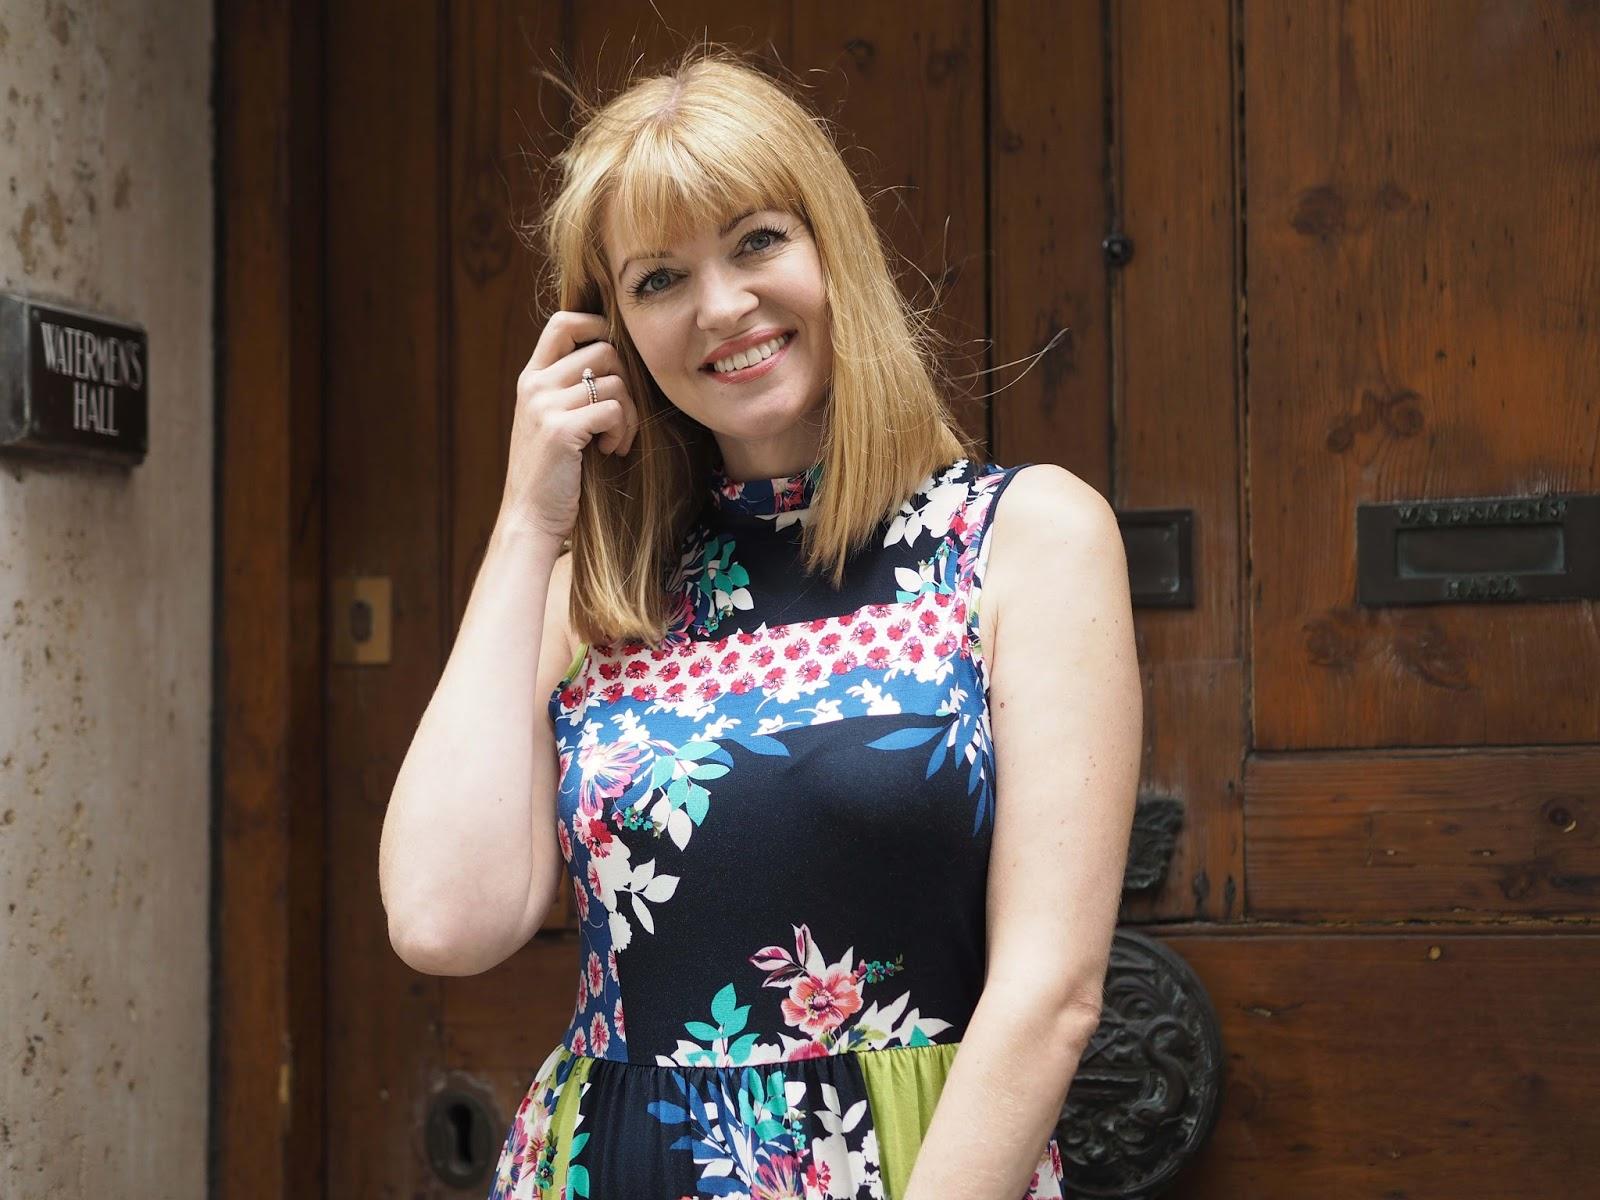 Multi-coloured floral ruffle dress. Fashion over 40